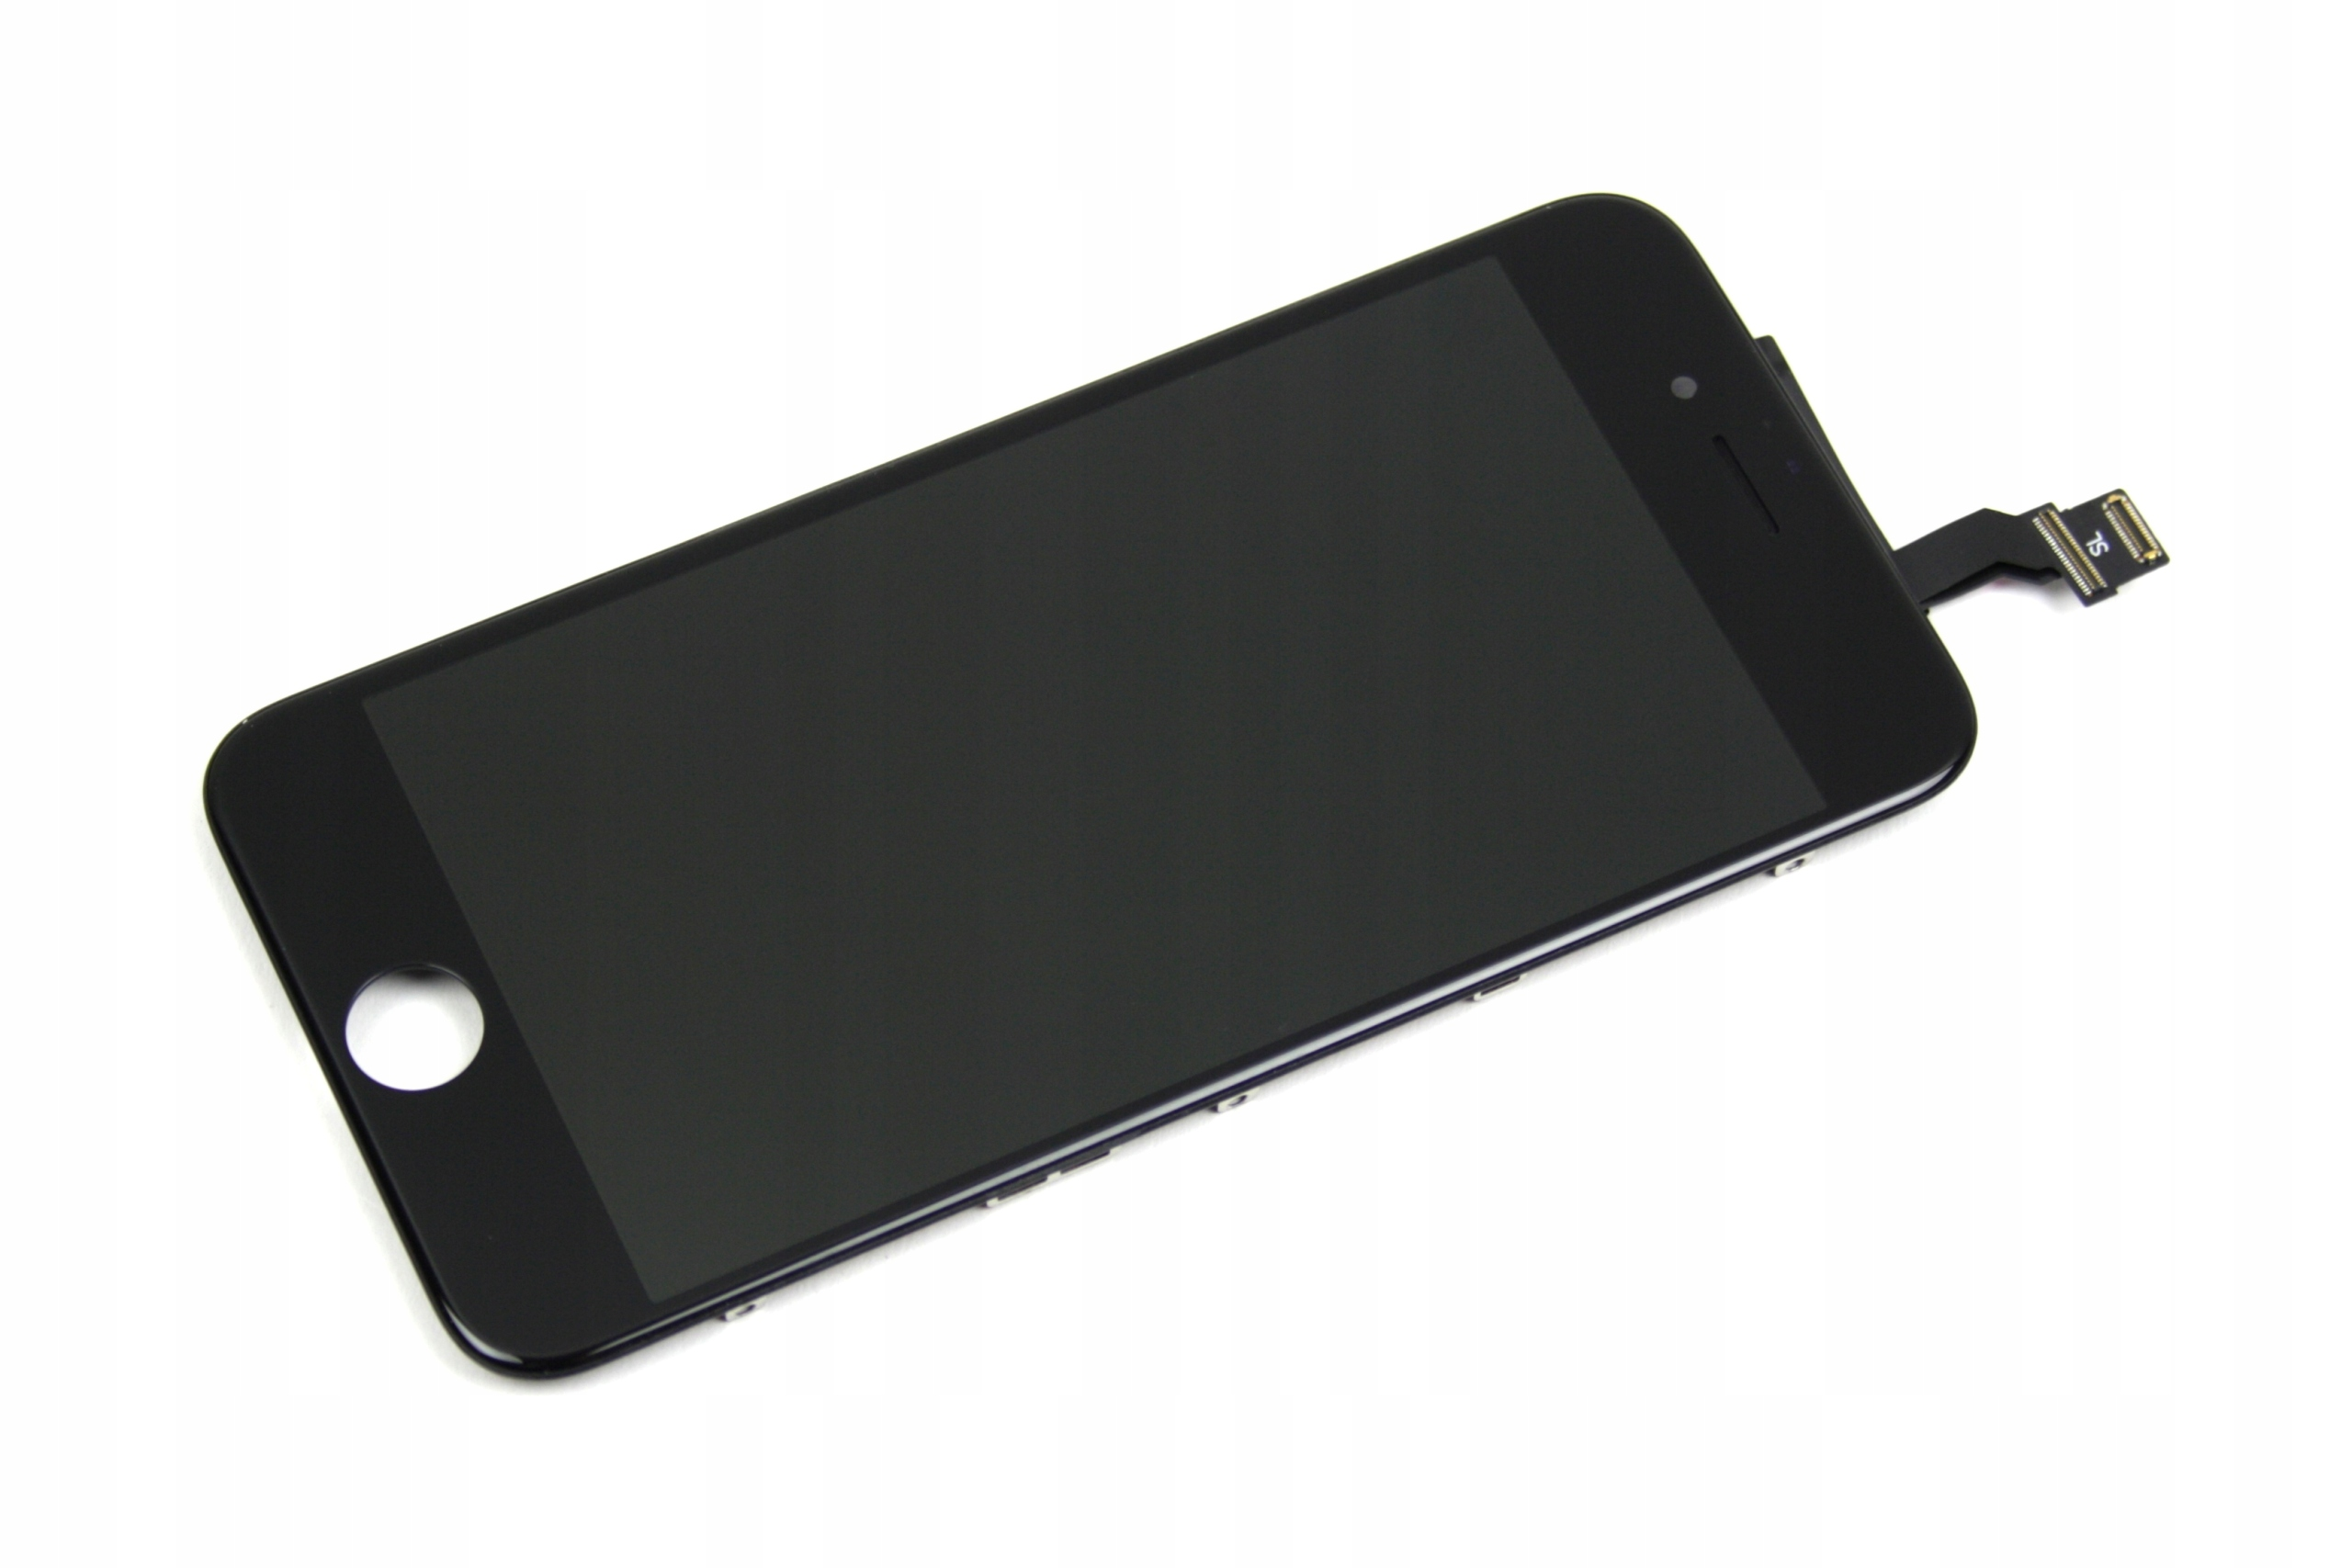 LCD WYŚWIETLACZ EKRAN DOTYK RAMKA IPHONE A1586 6